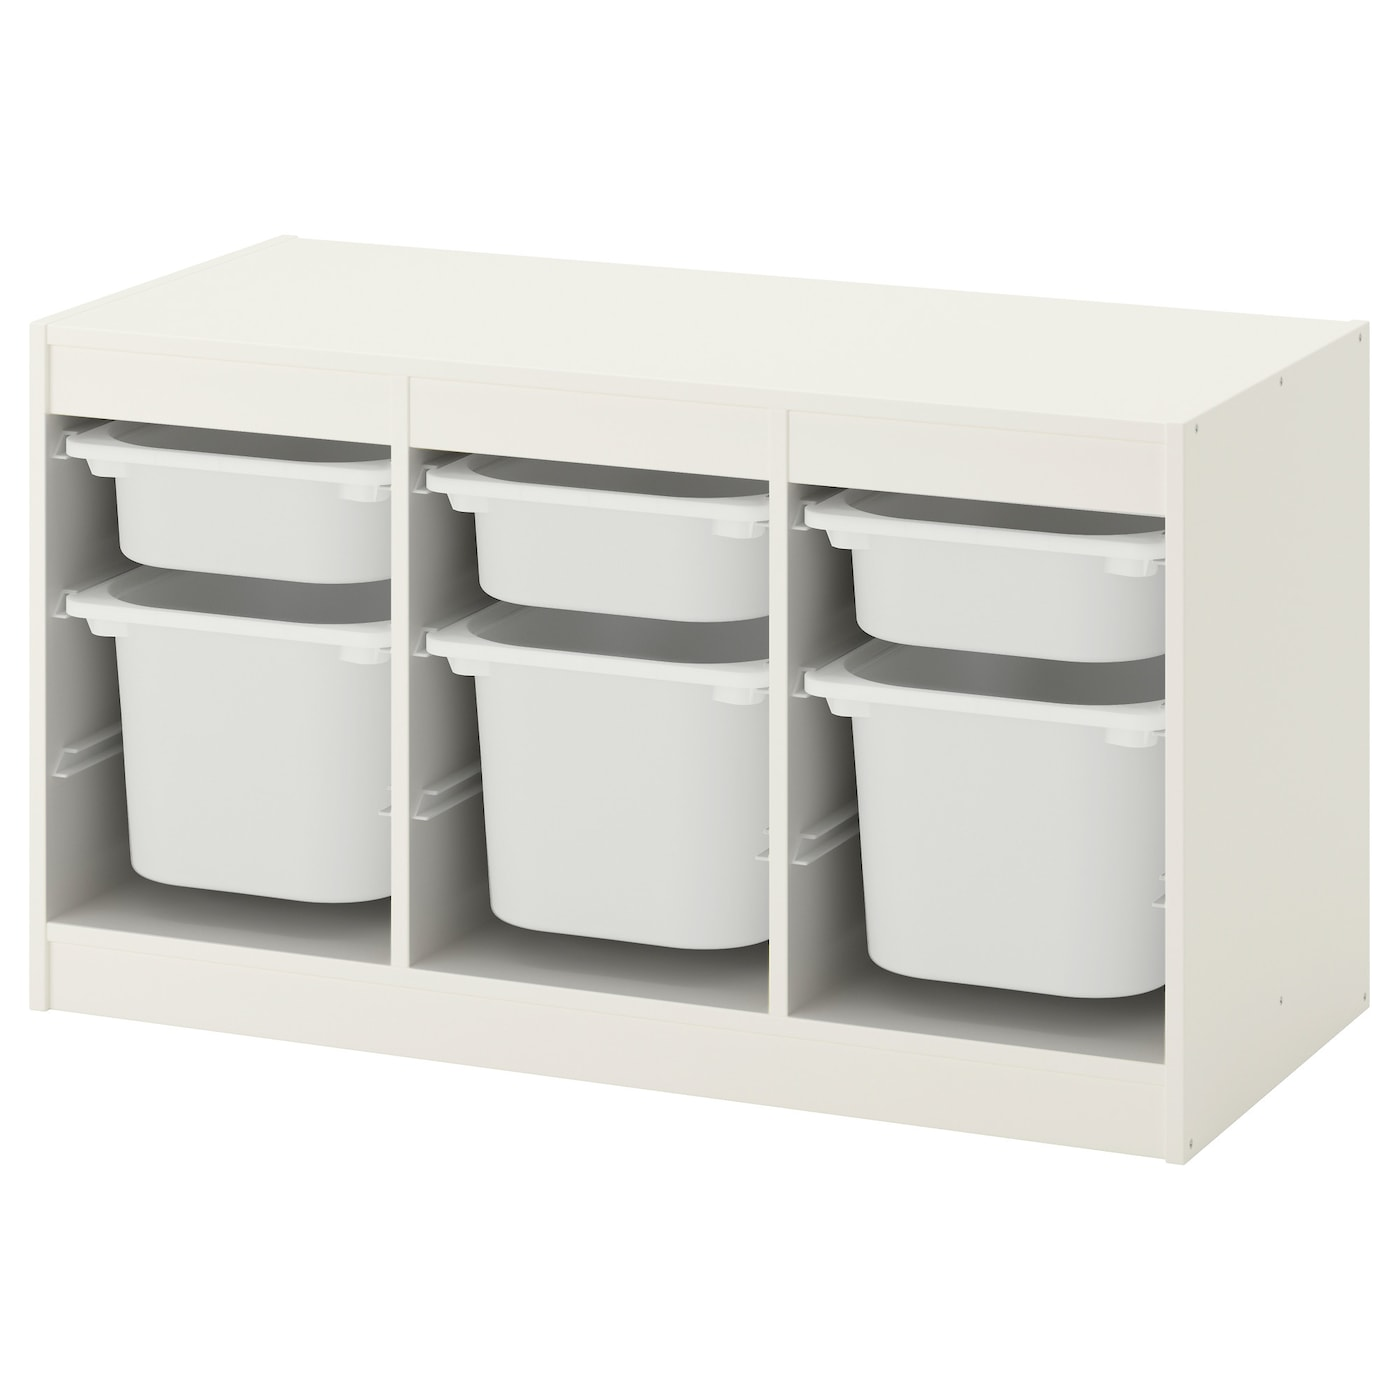 trofast storage combination with boxes white 99x44x56 cm